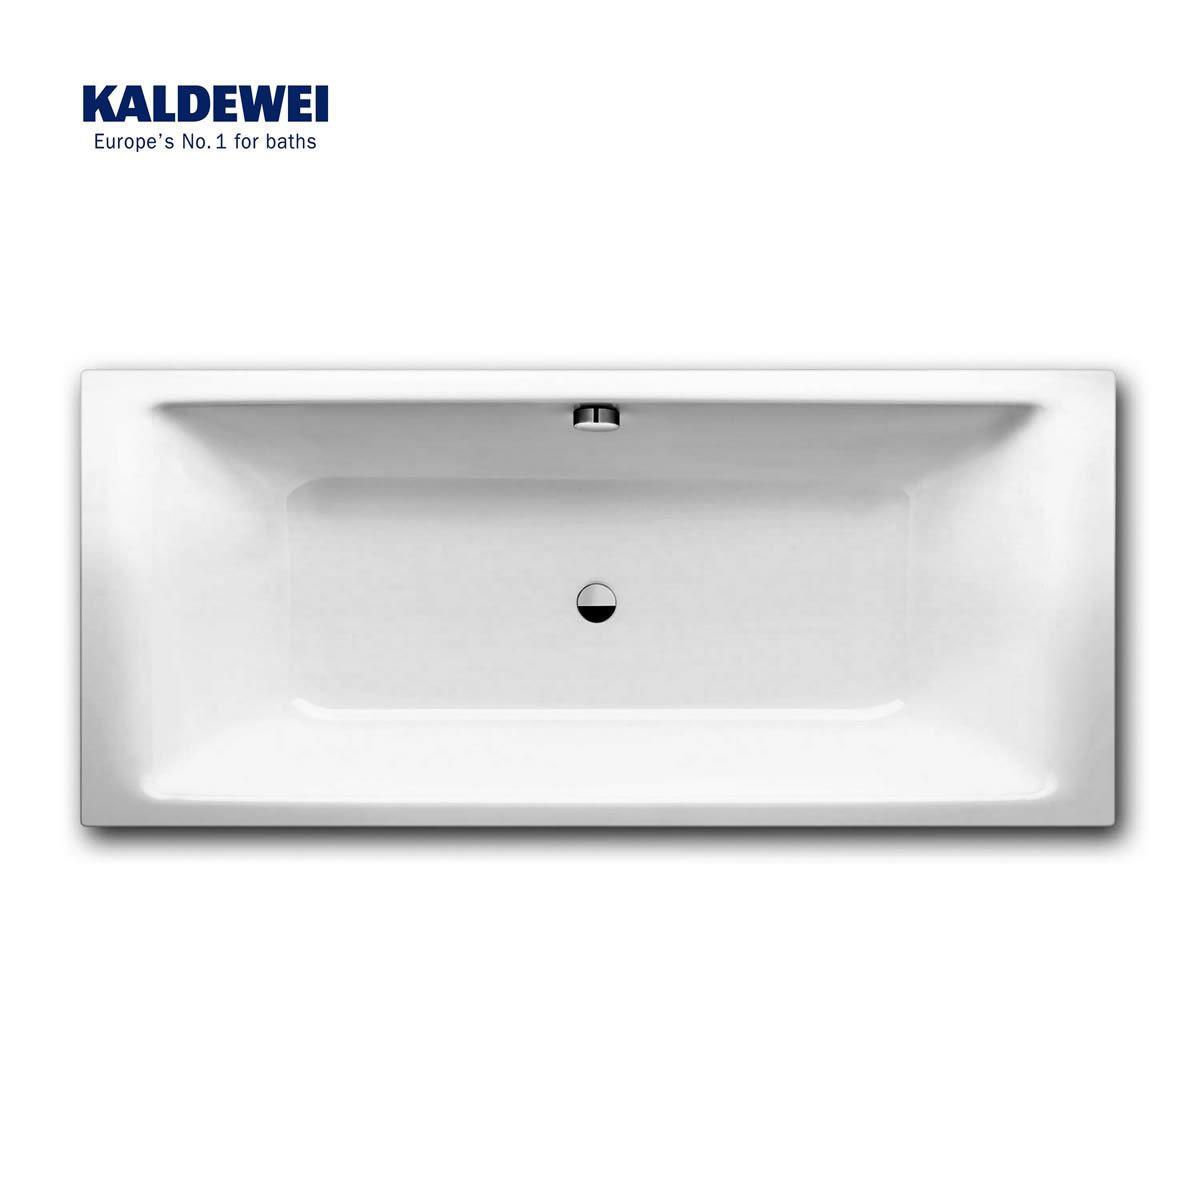 Kaldewei Puro Duo Bathtub, 20 20x20mm Alpine White,   Rrp ...